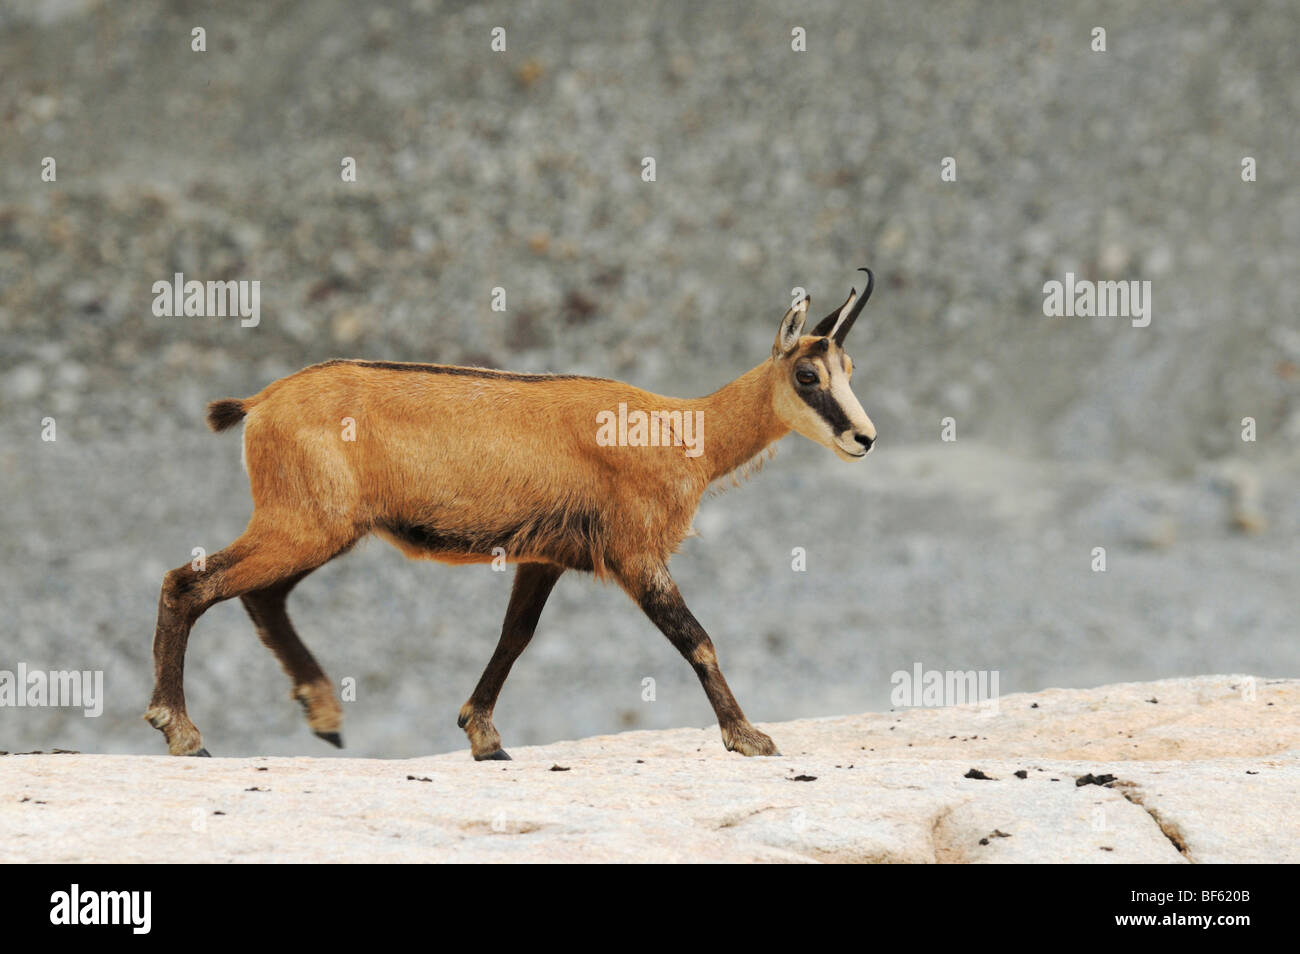 Chamois (Rupicapra rupicapra), adult walking, Grimsel, Bern, Switzerland, Europe - Stock Image